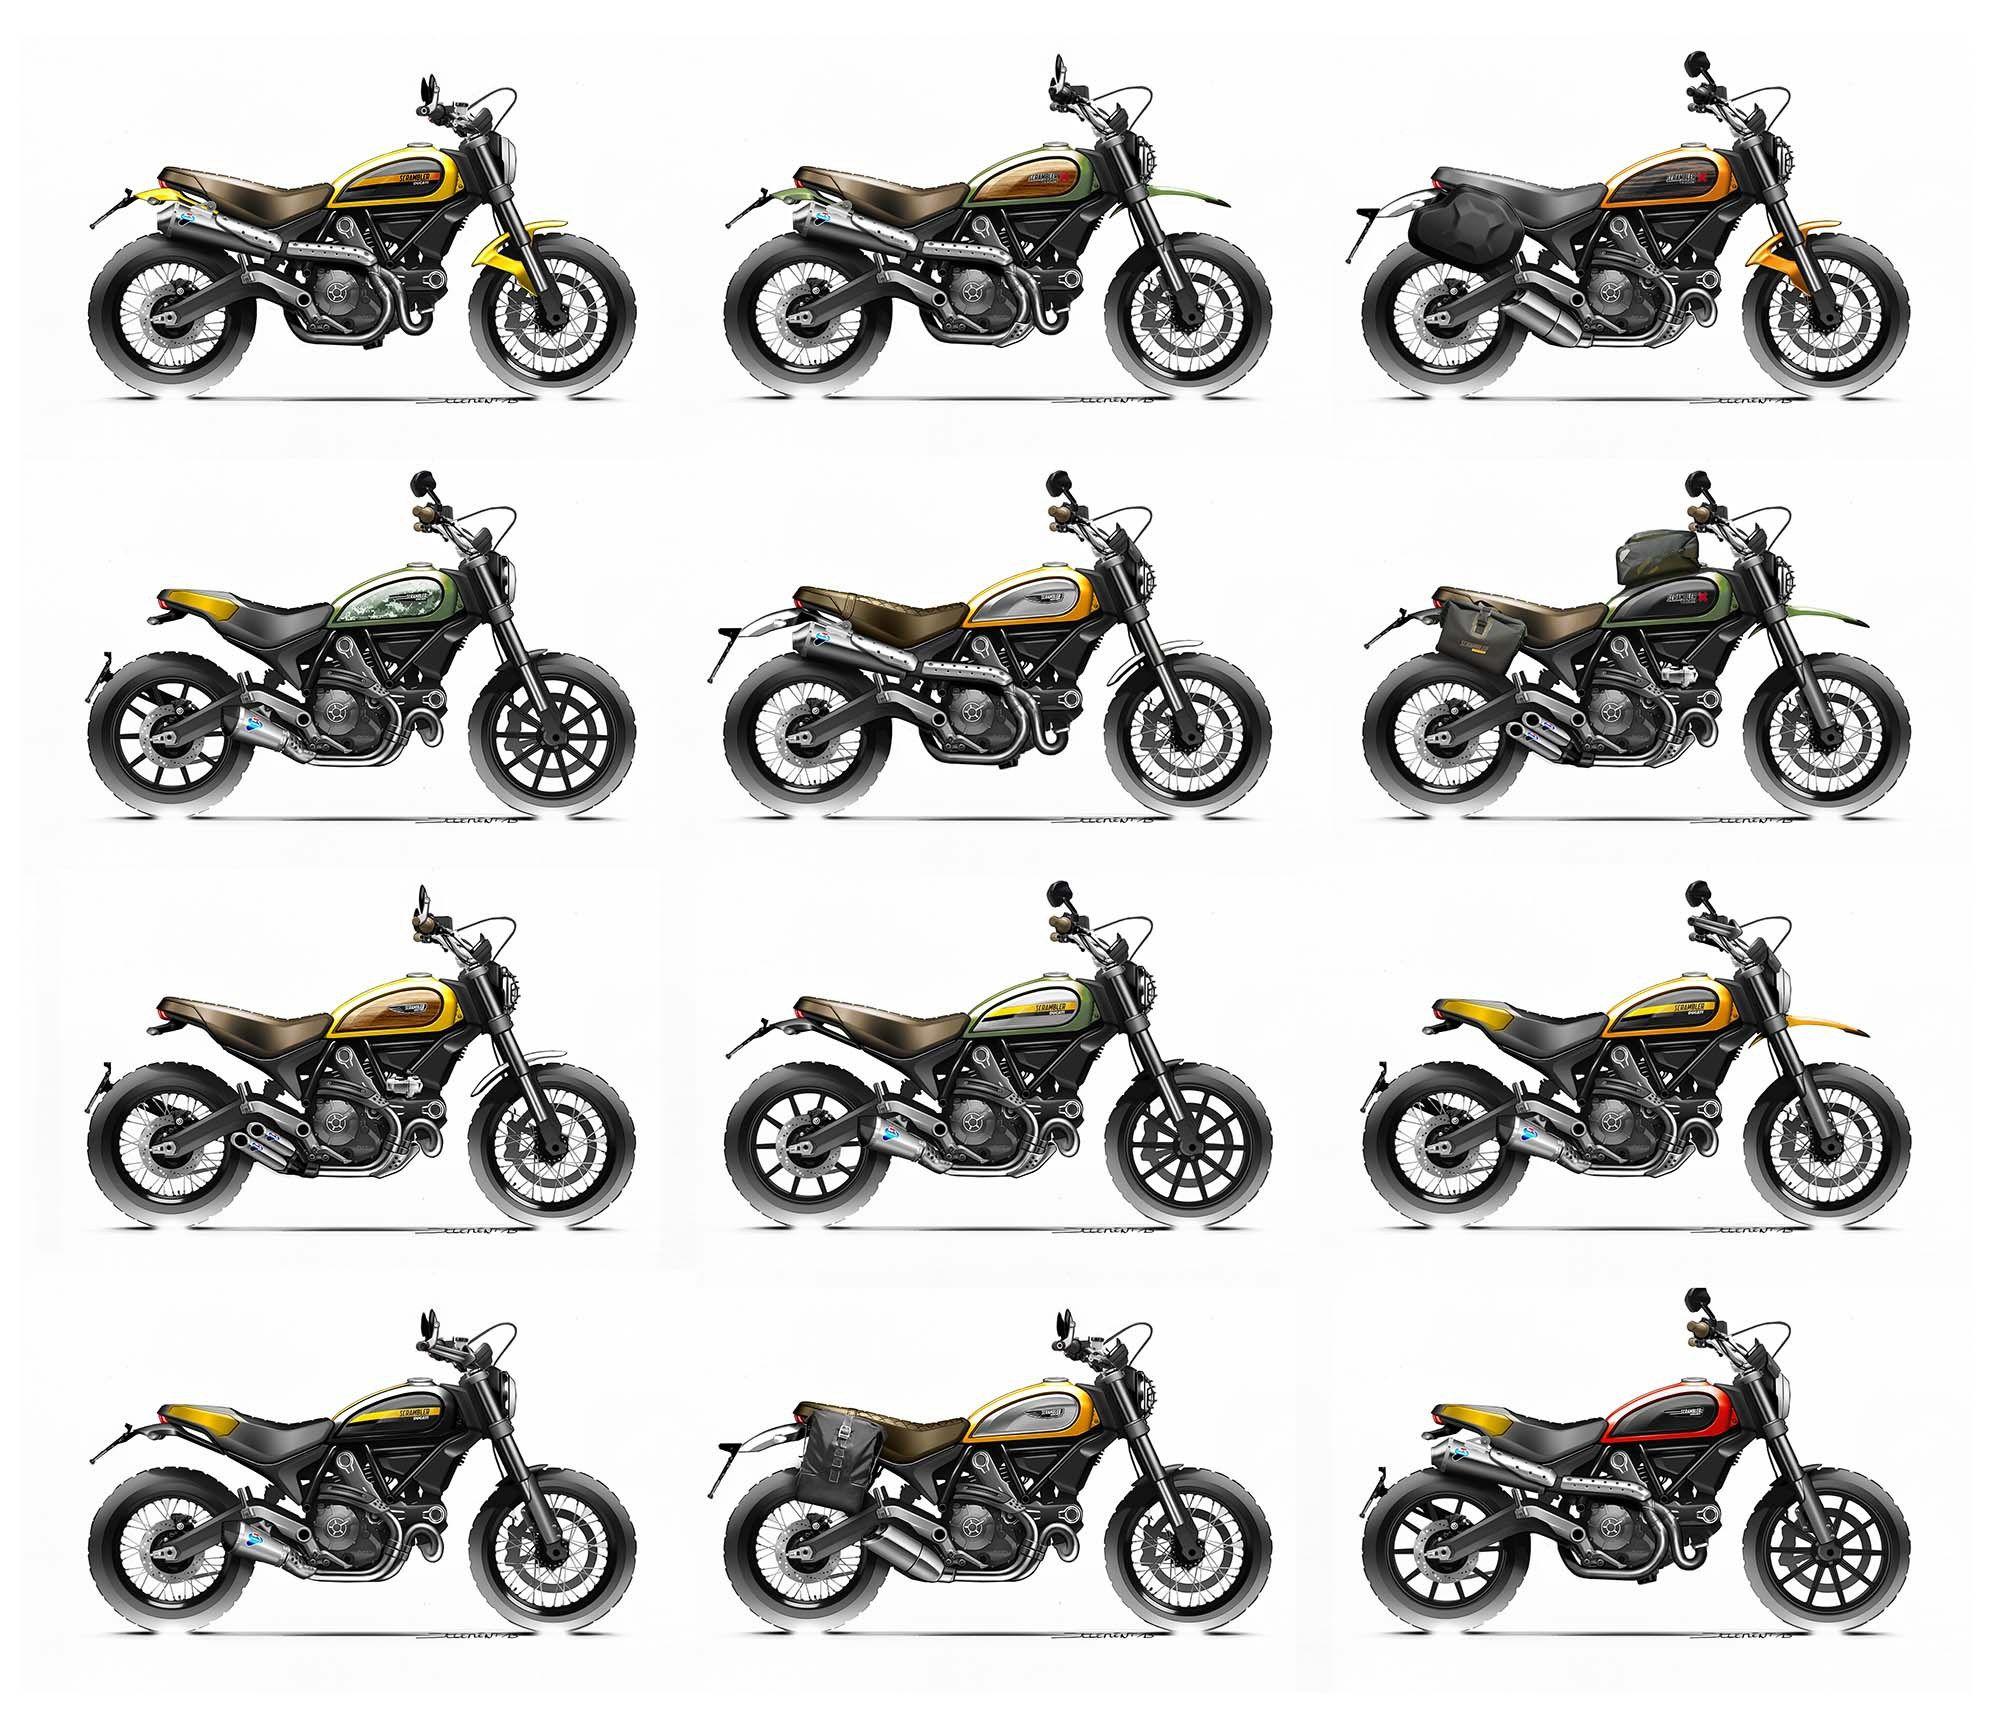 Ducati Scrambler Varianten